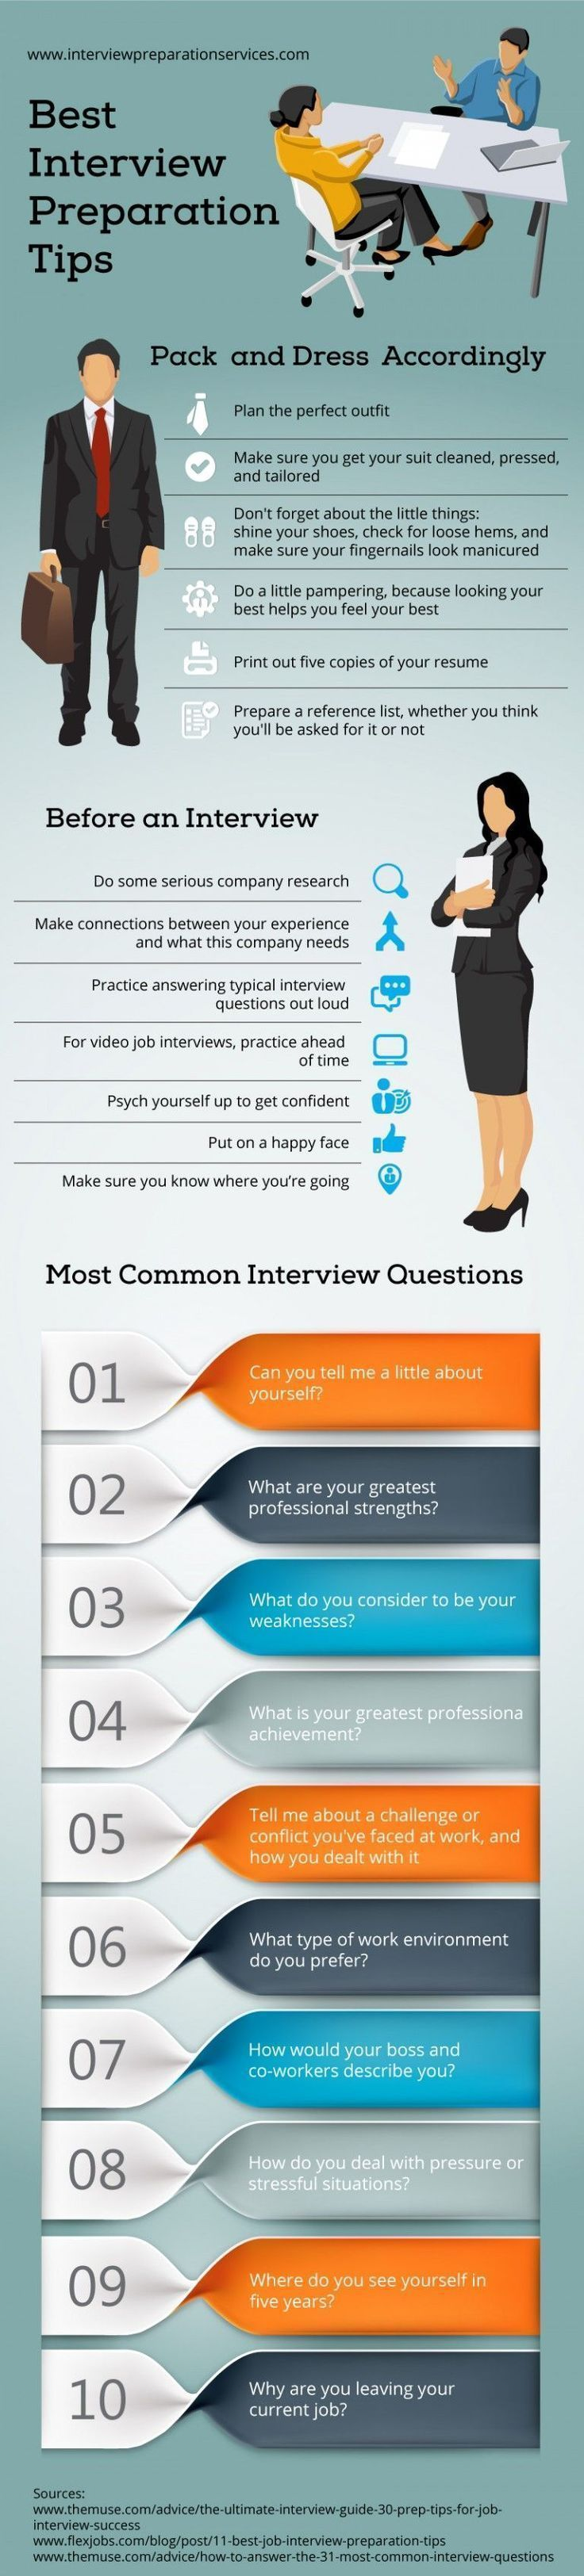 Best 25 Rn resume ideas on Pinterest